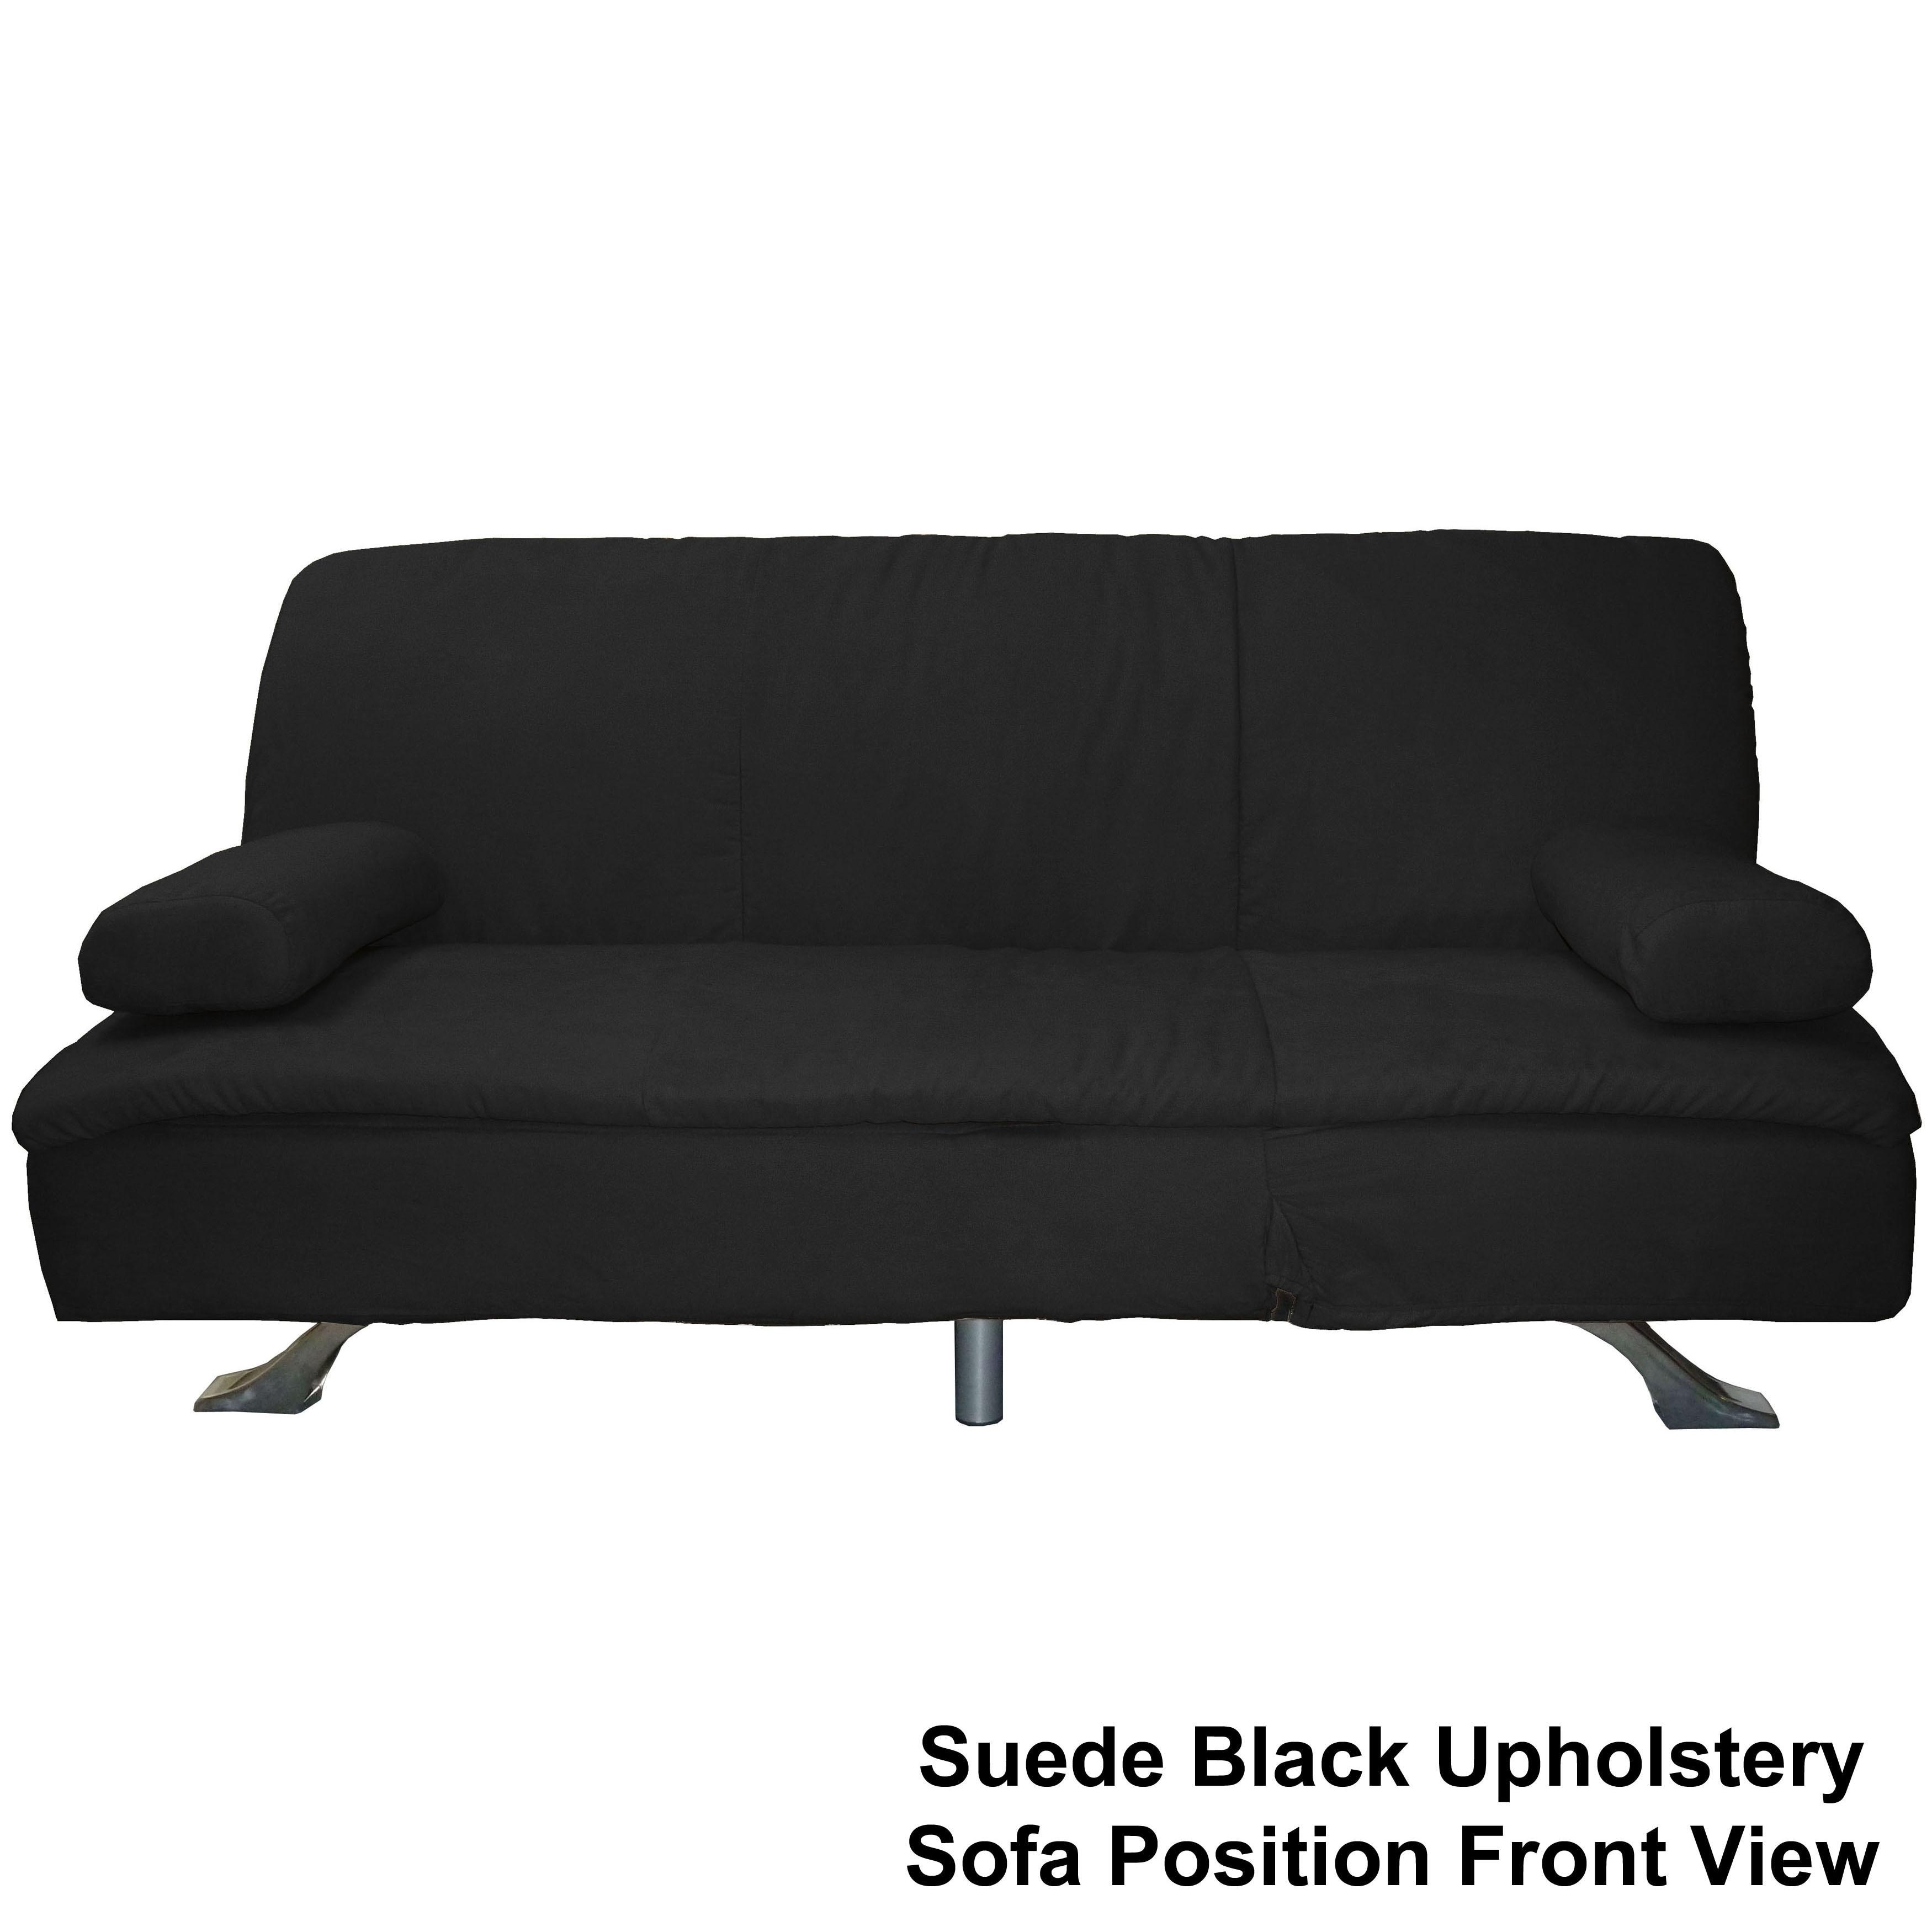 Mystic Microfiber Suede Click Clack Futon Sofa Bed Free Shipping Today Com 4232499